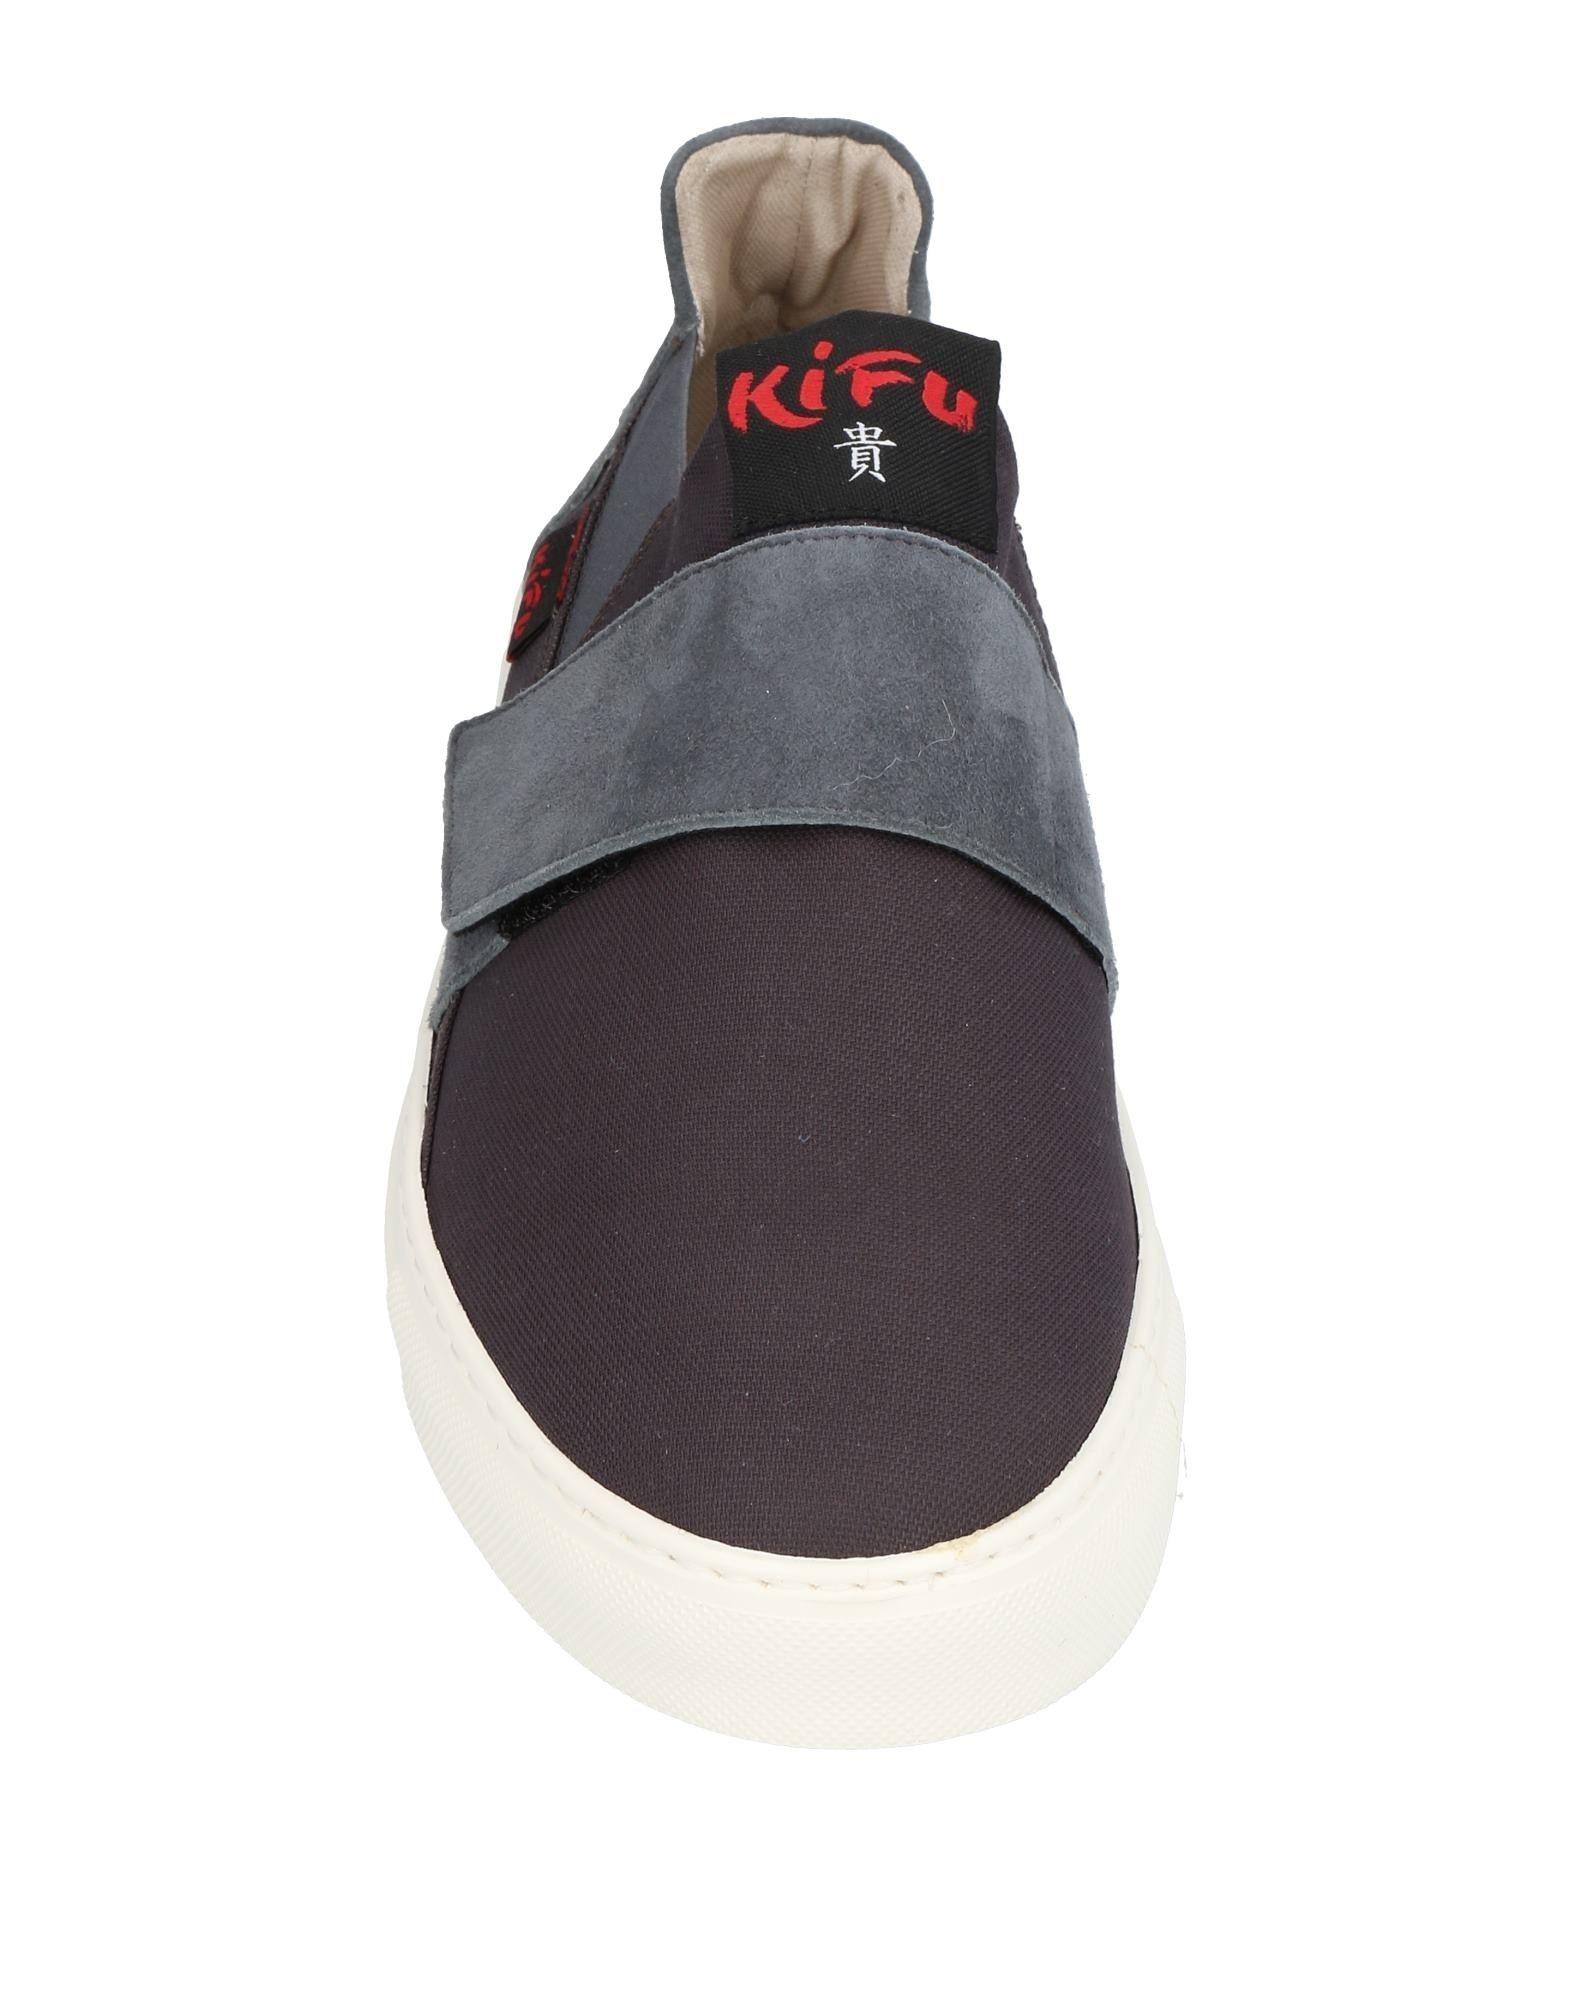 Sneakers Kifu Homme - Sneakers Kifu sur